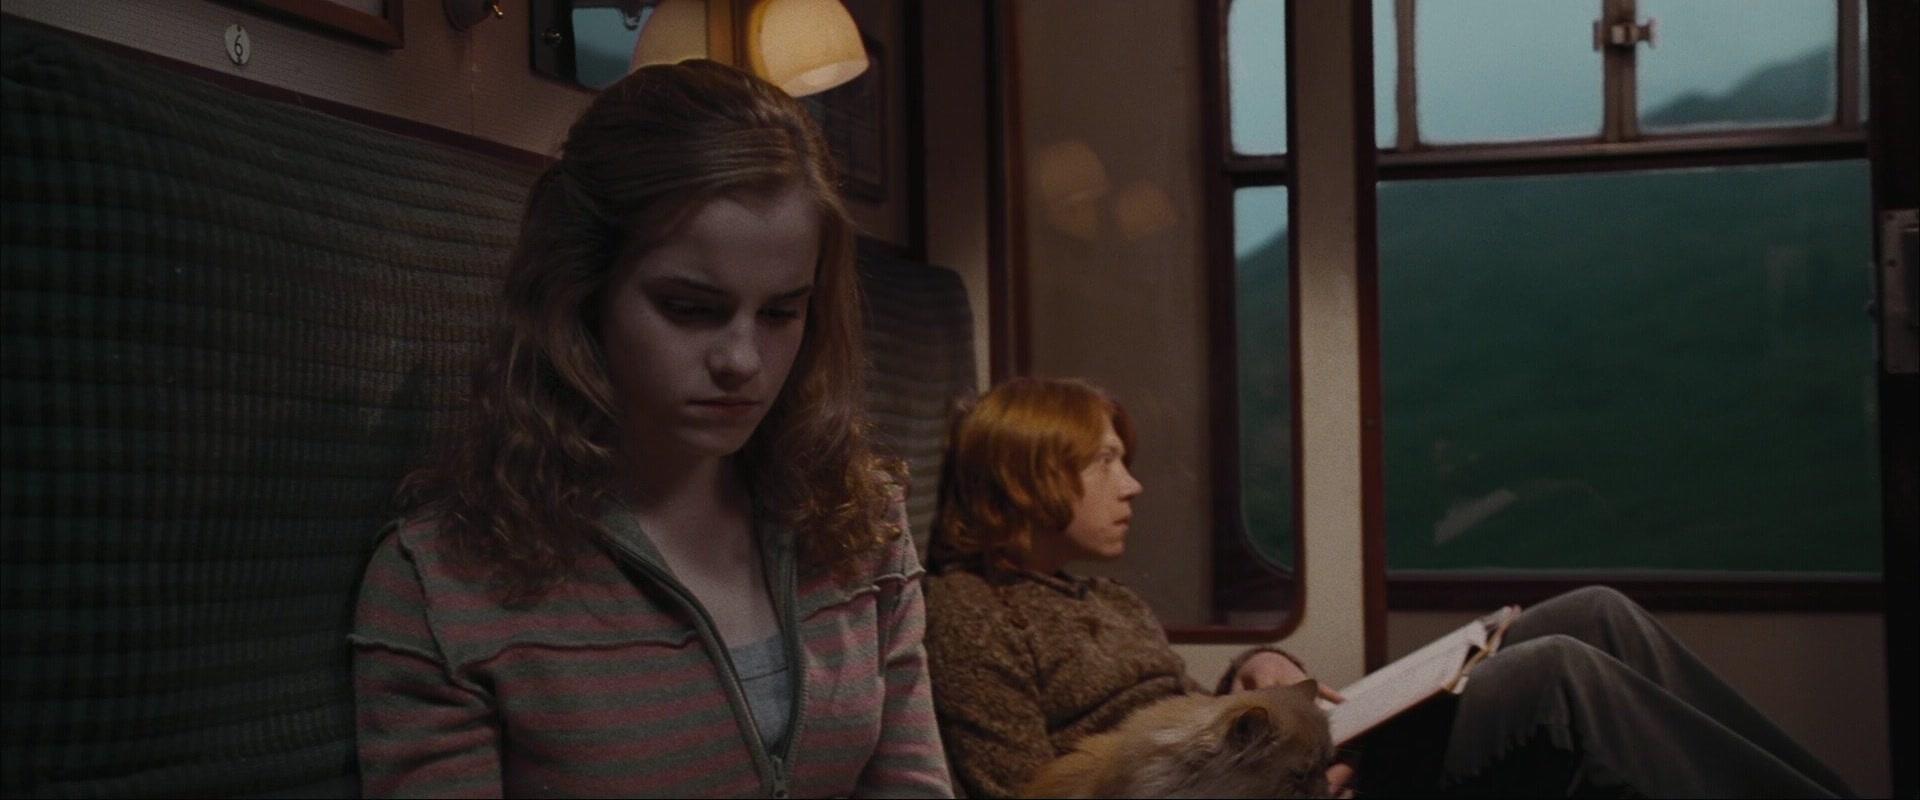 Ron & Hermione Scr...